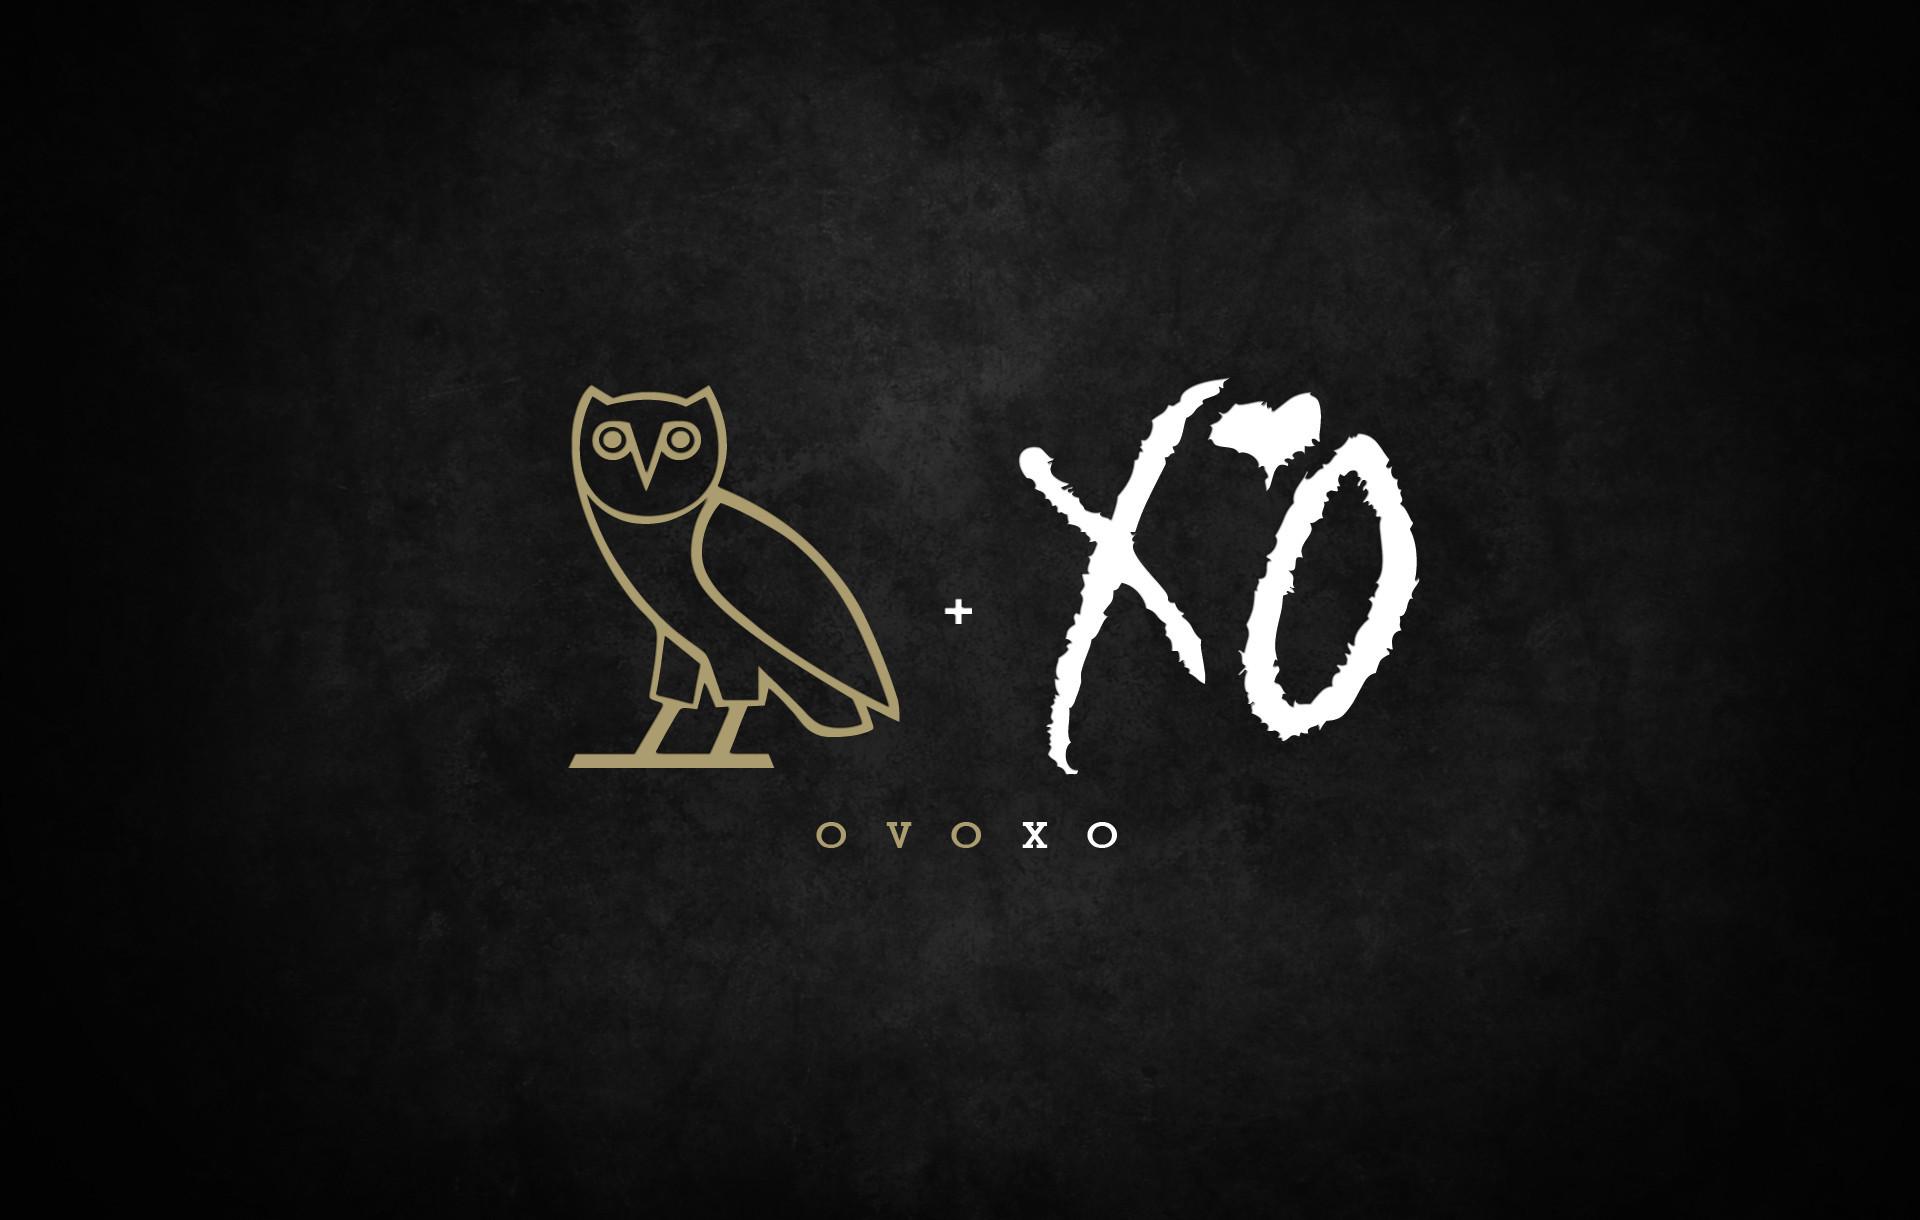 Drake Owl IPhone Wallpaper (74+ Images